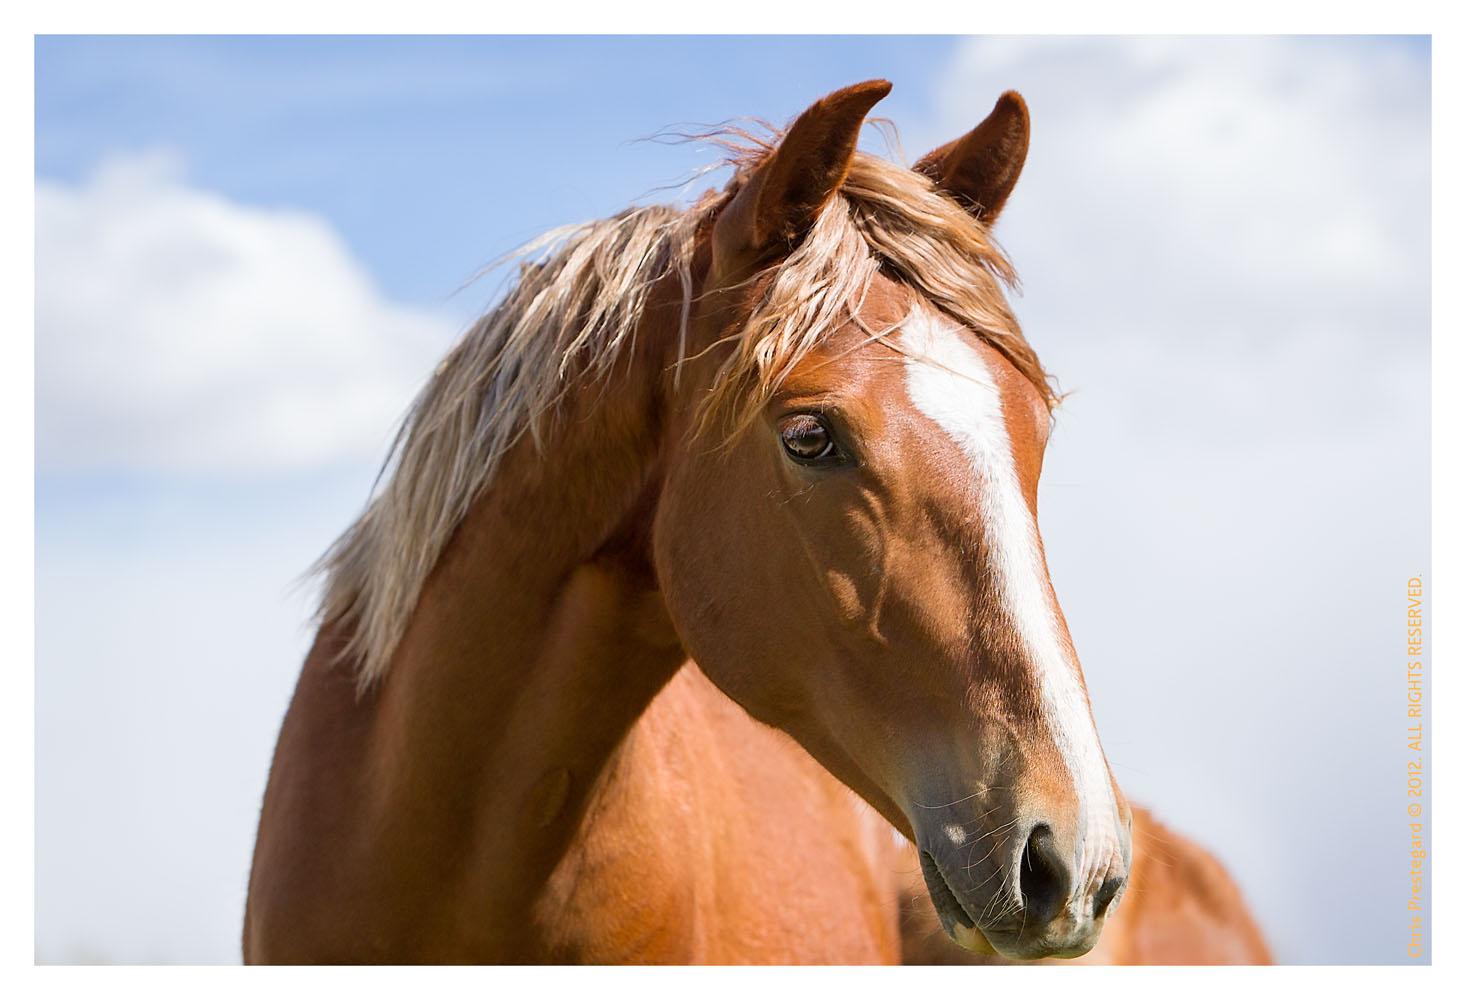 Horse3856-Feb15-2012